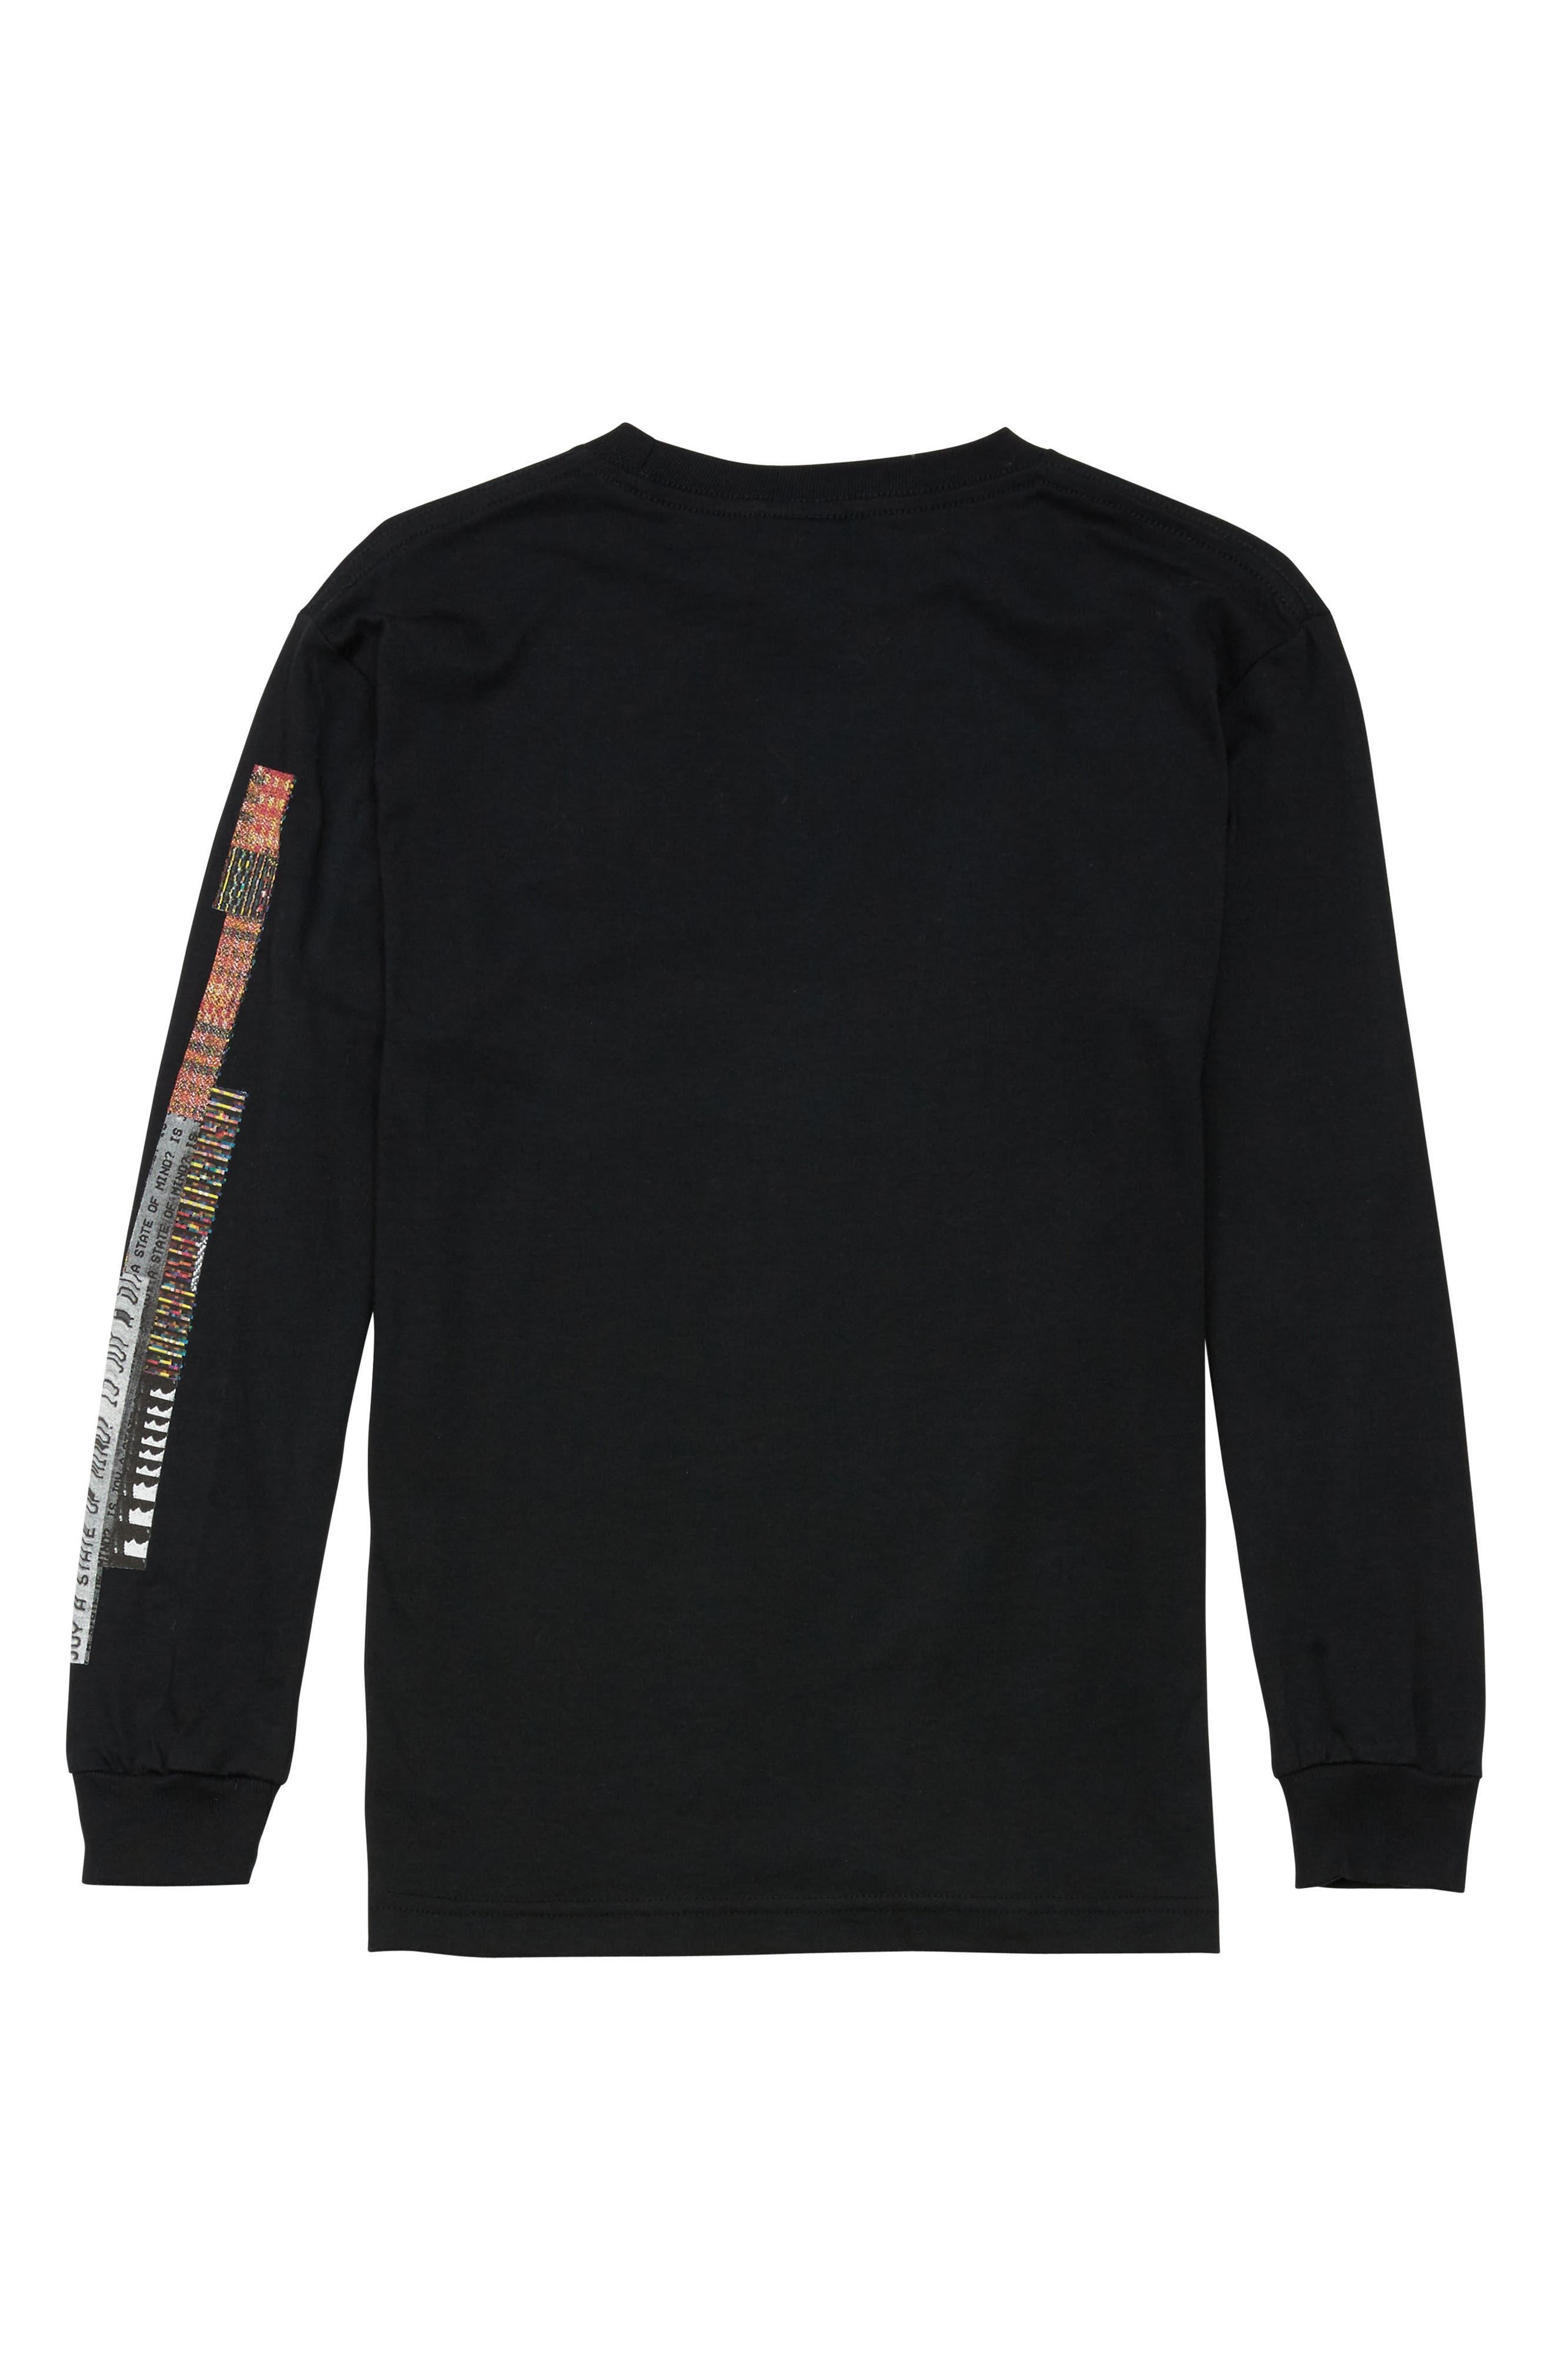 Noa Noise Graphic T-Shirt,                             Alternate thumbnail 2, color,                             BLACK